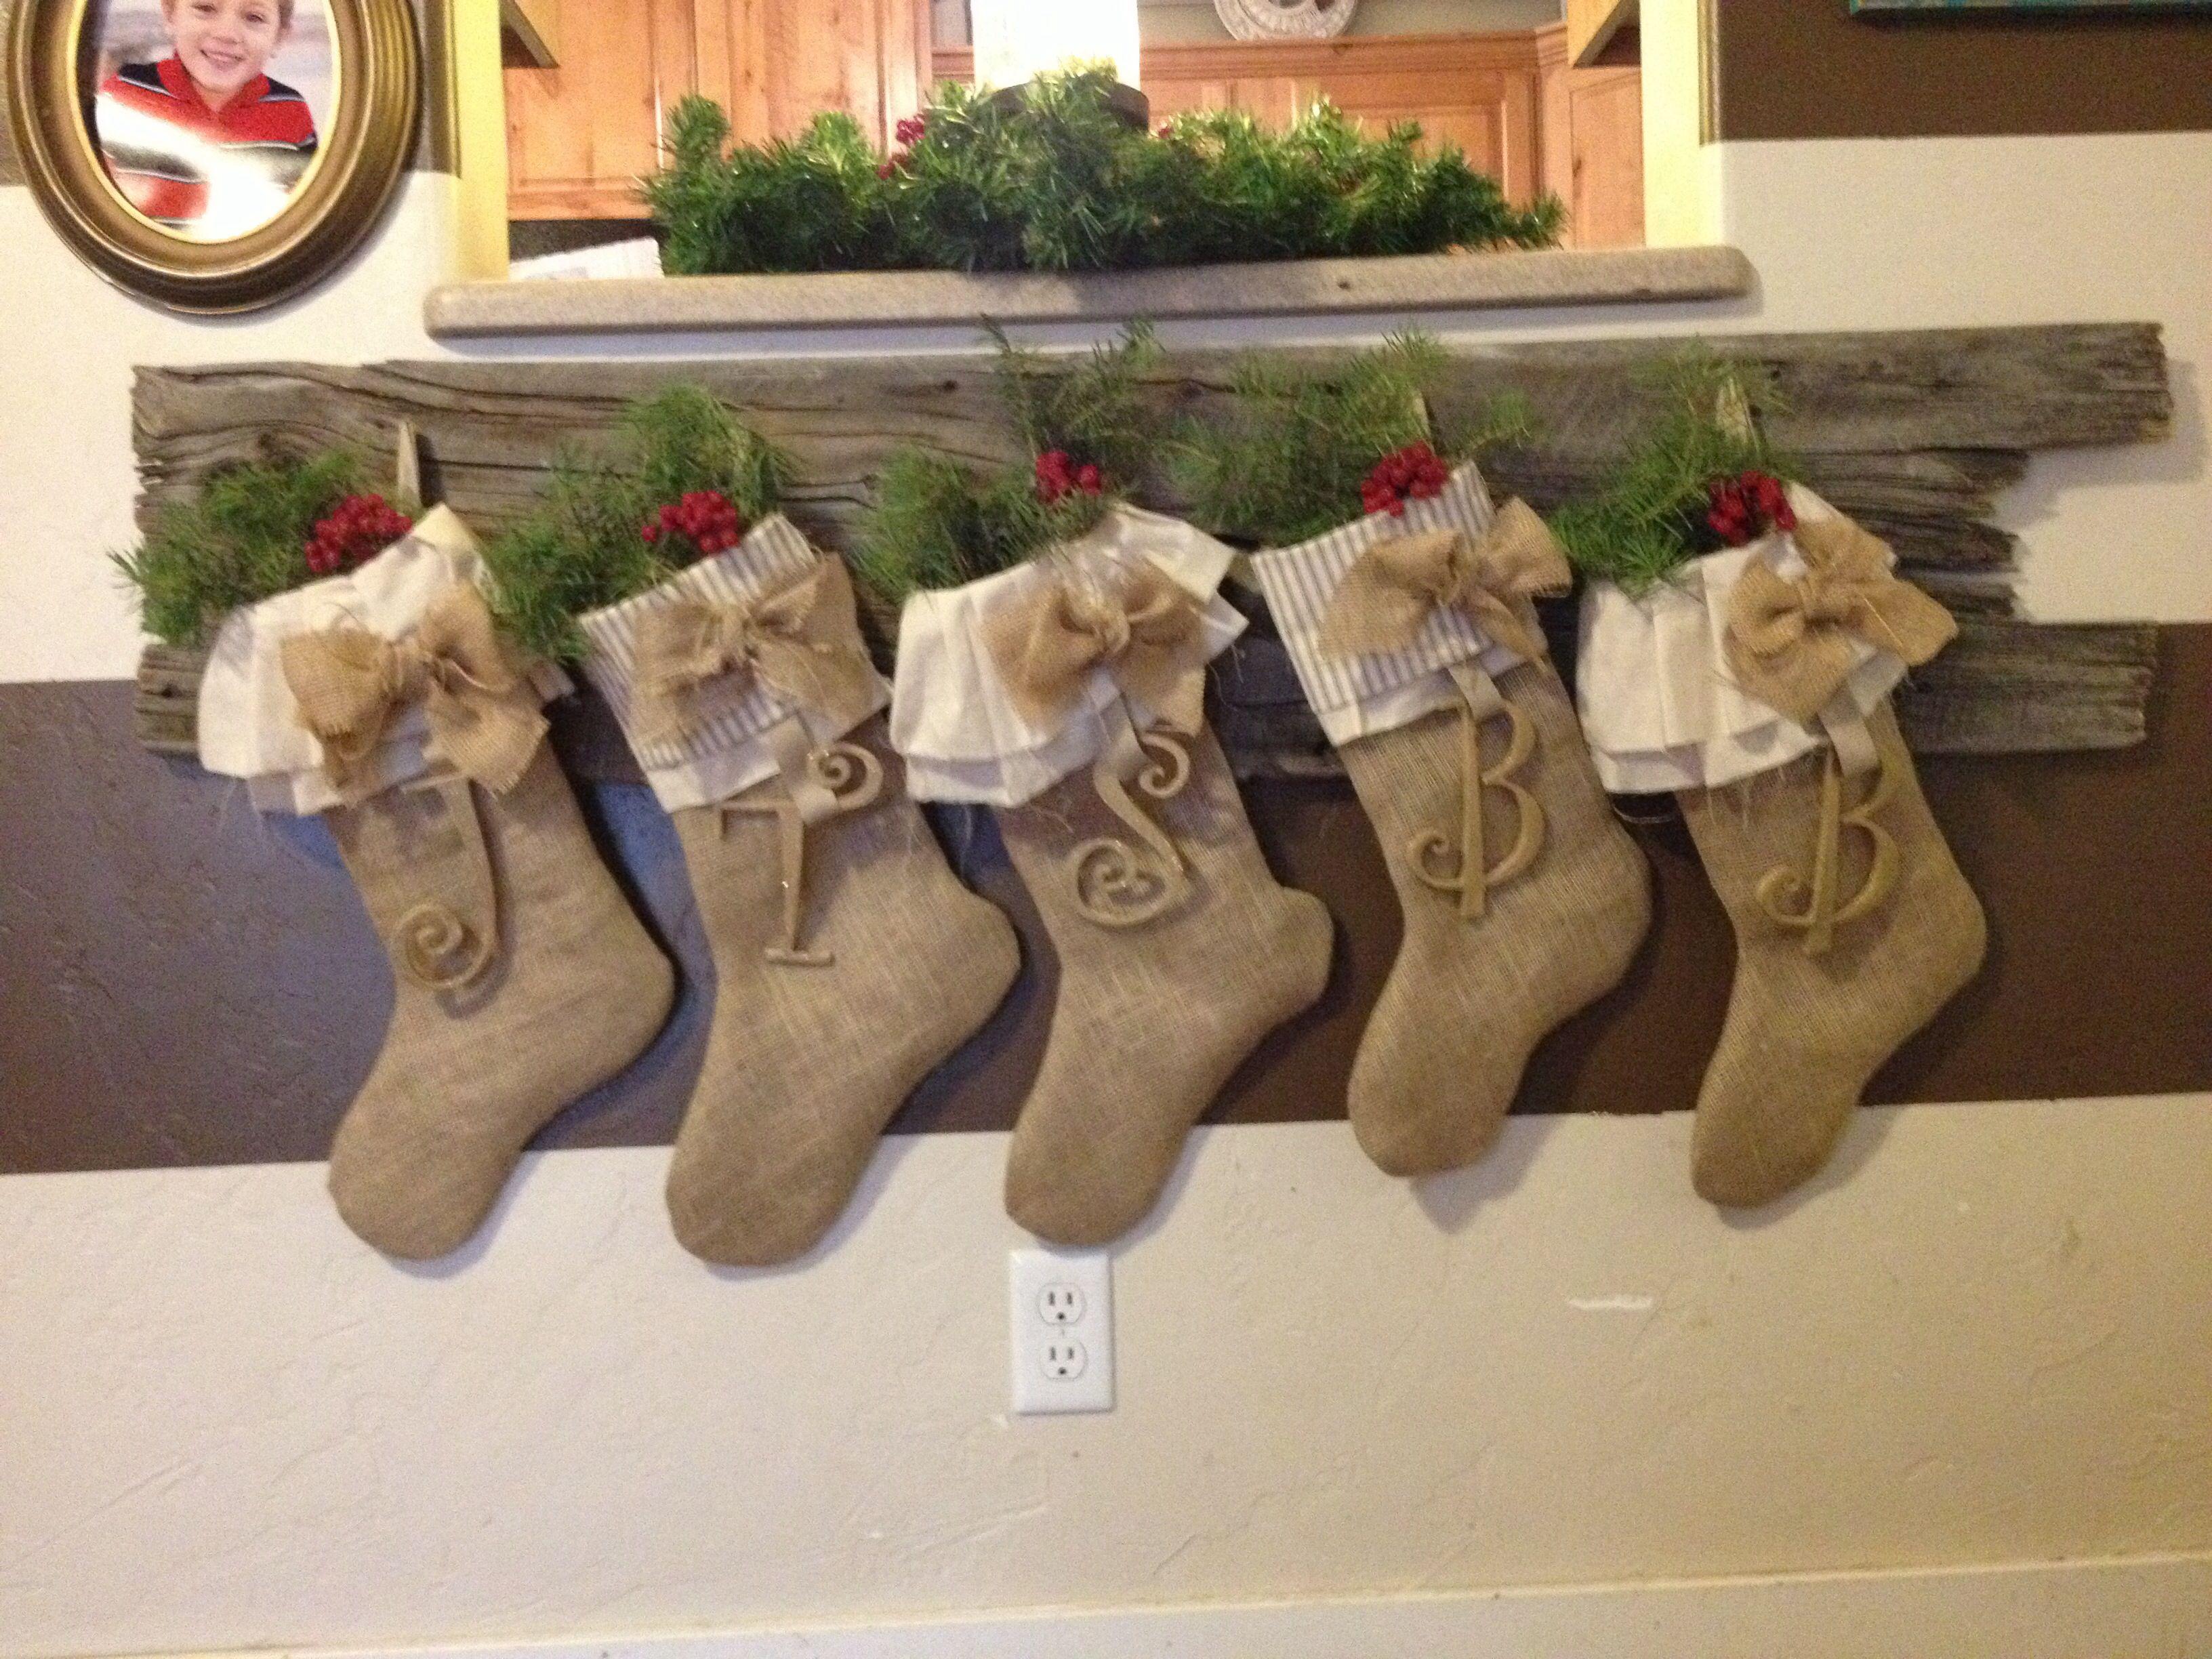 Christmas Decor Burlap Initial Stockings